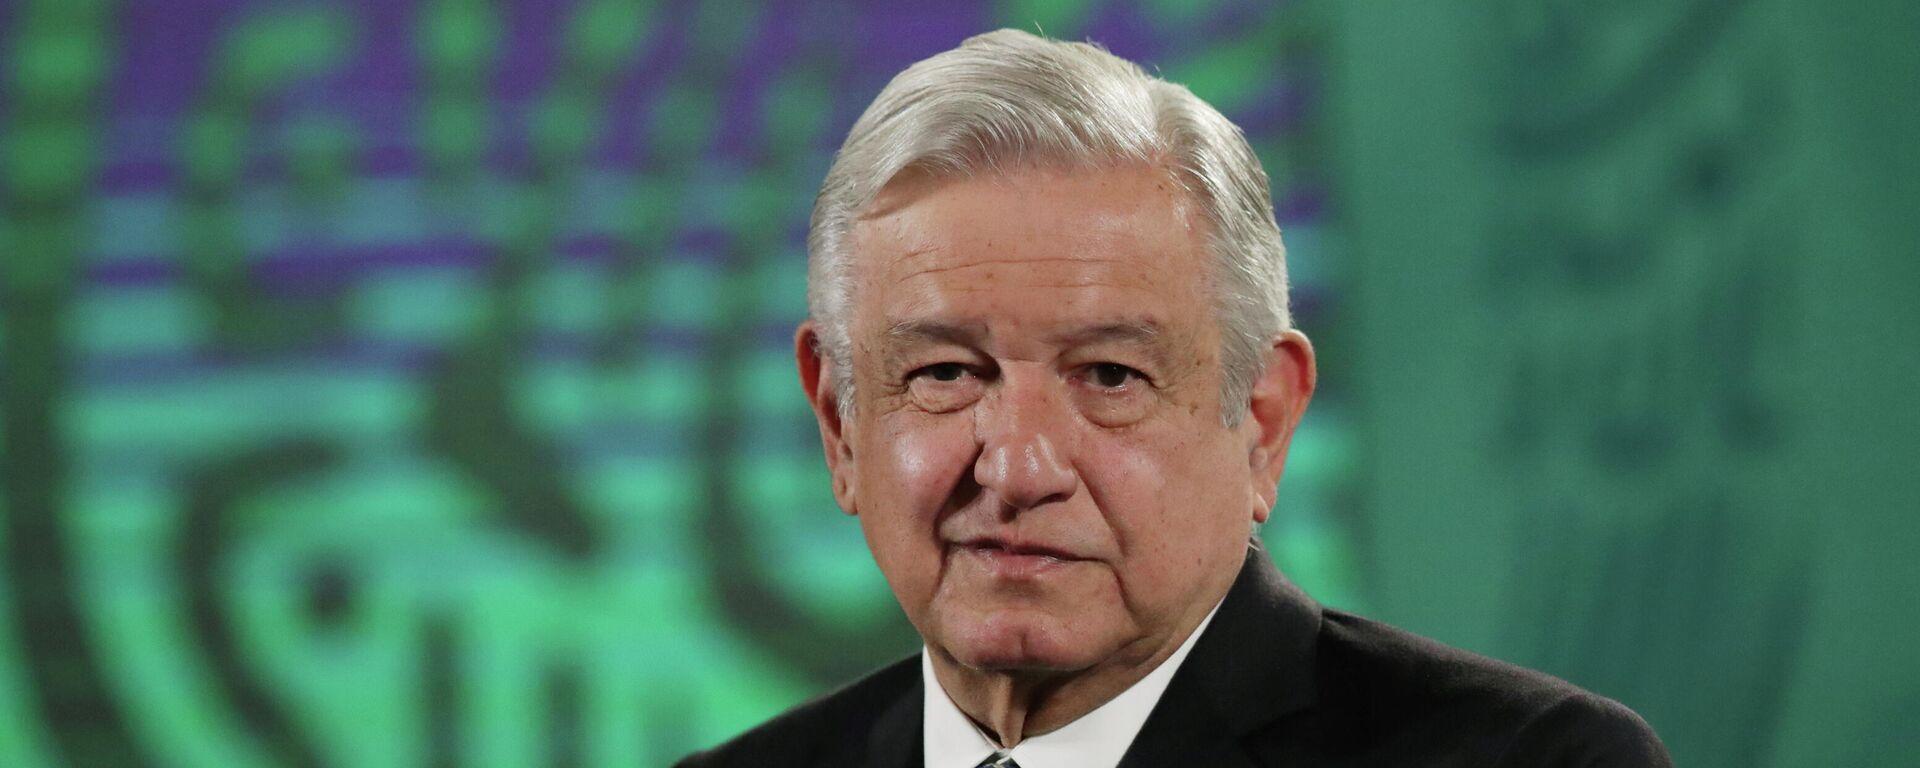 Andrés Manuel López Obrador, el presidente de México  - Sputnik Mundo, 1920, 14.05.2021